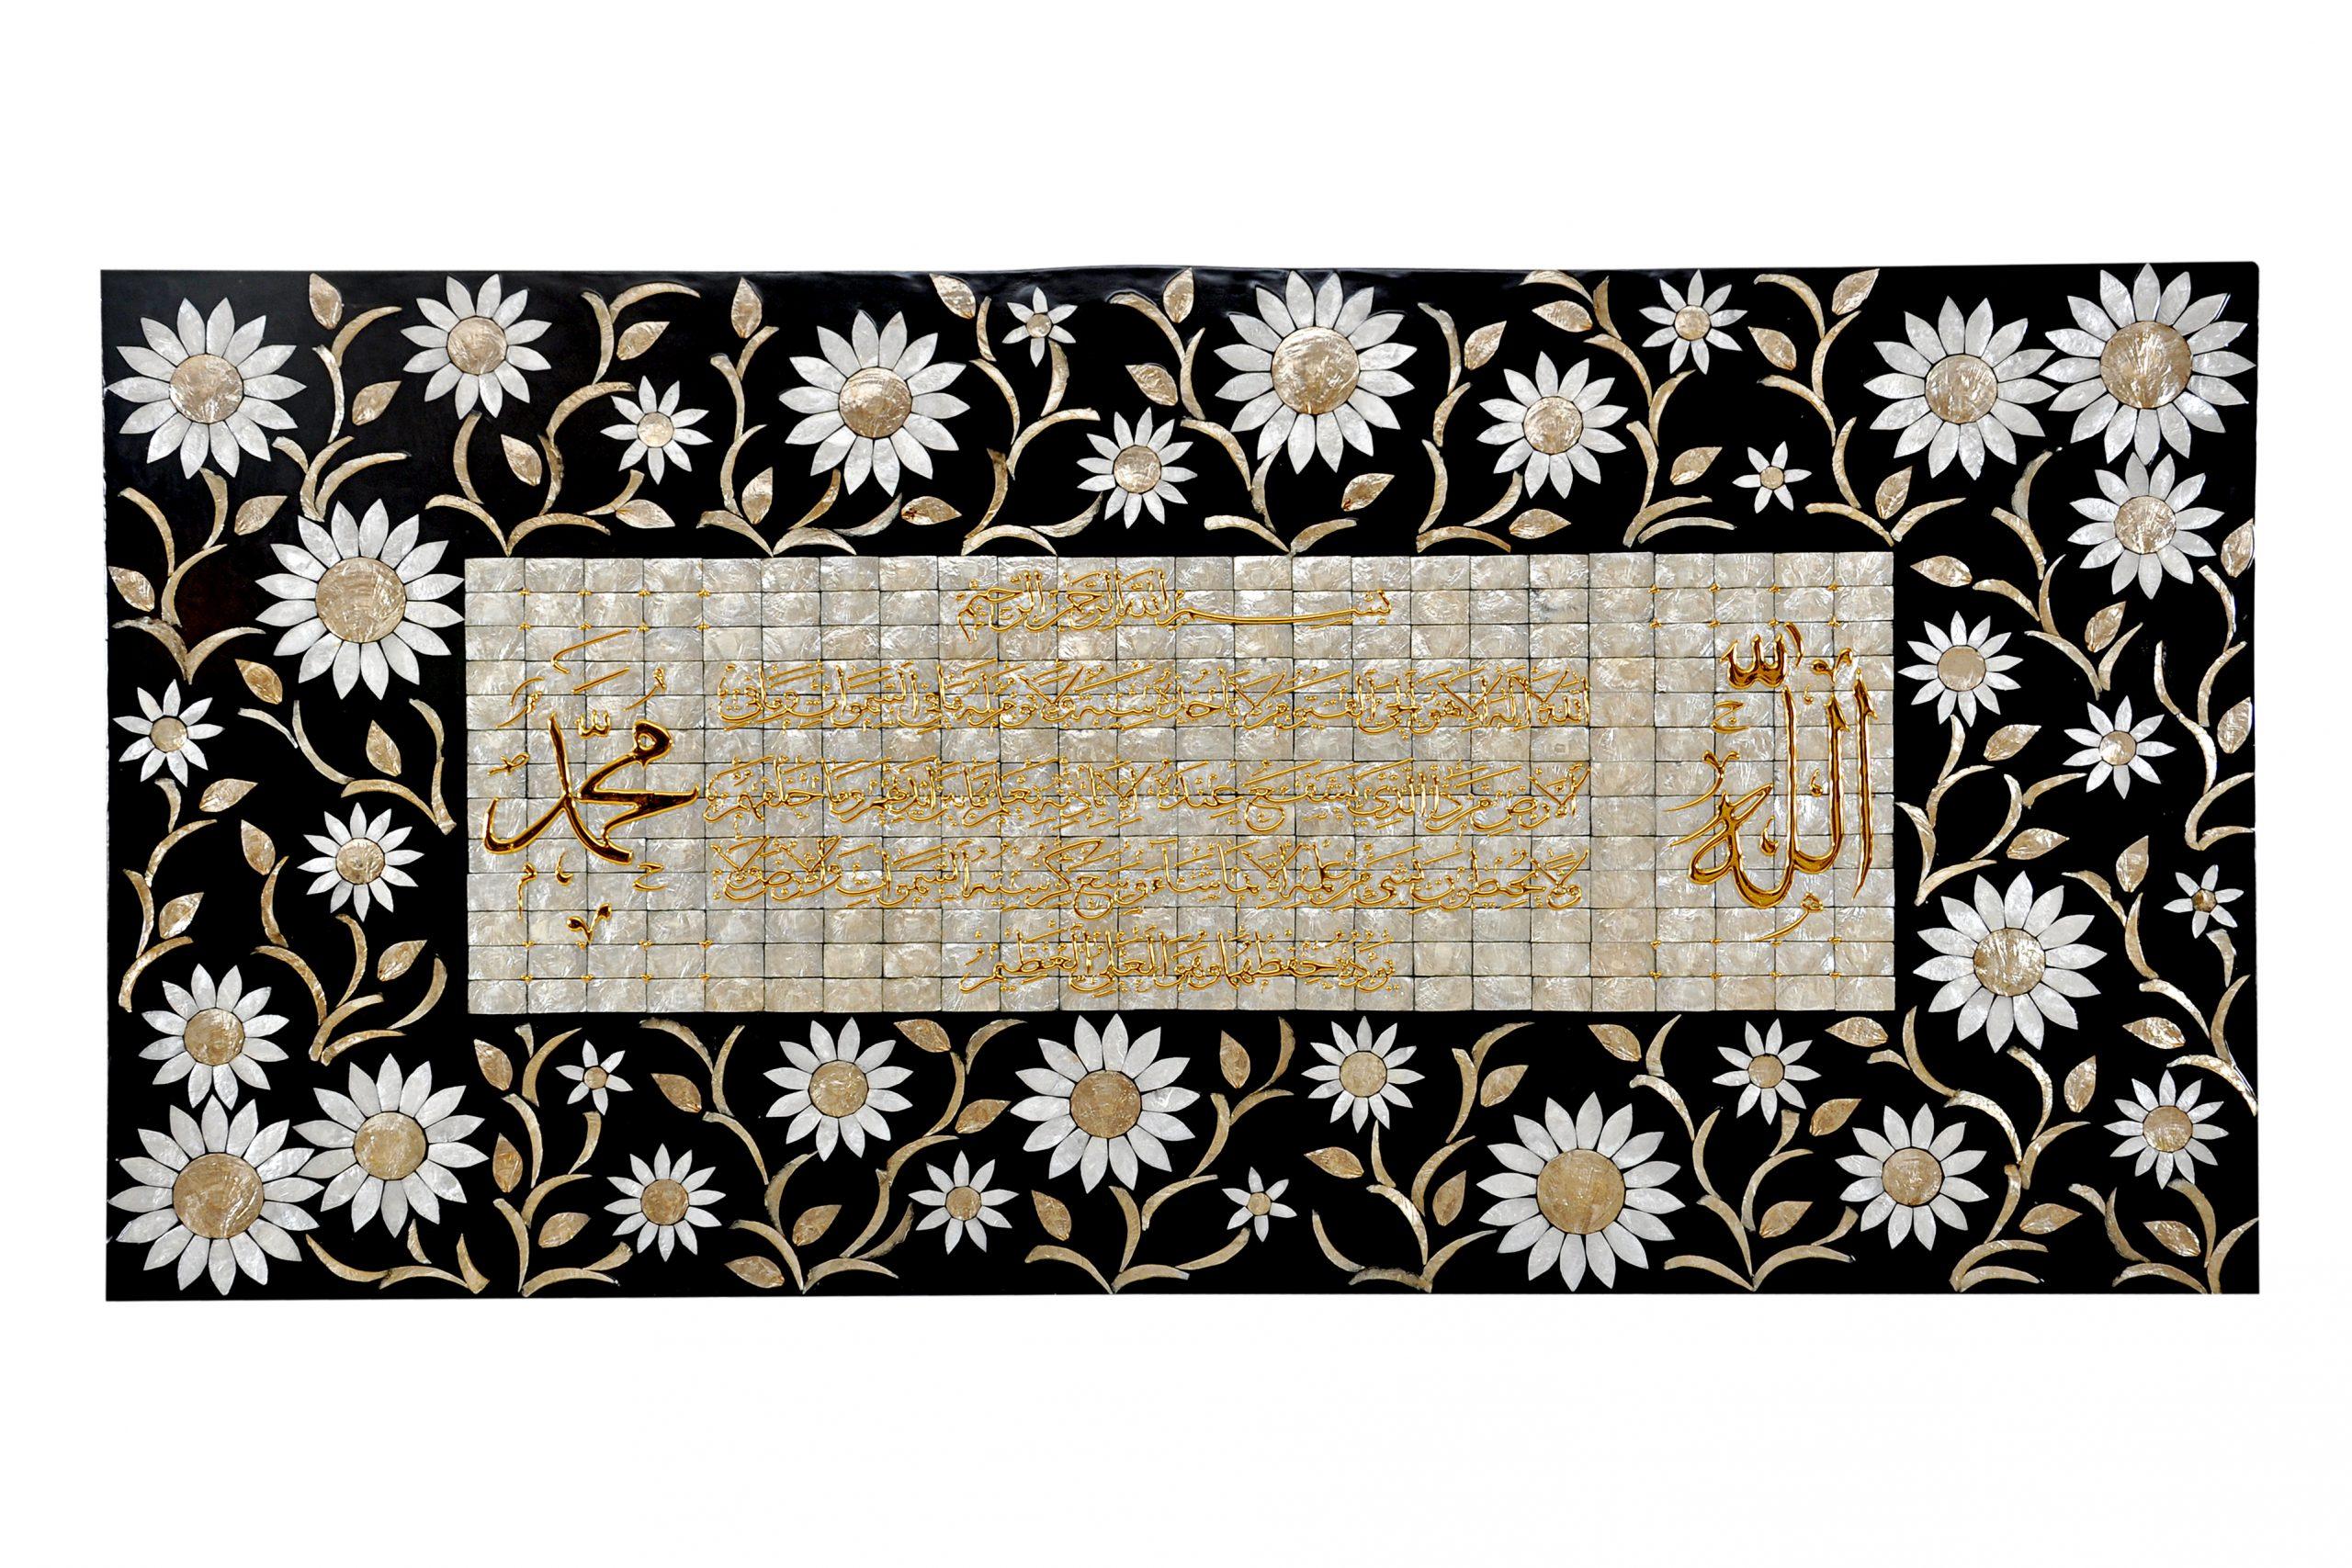 Seashell Handicrafts, capiz shells, abalone, mother of pearl, callygraphy, handicrafts shellcrafts